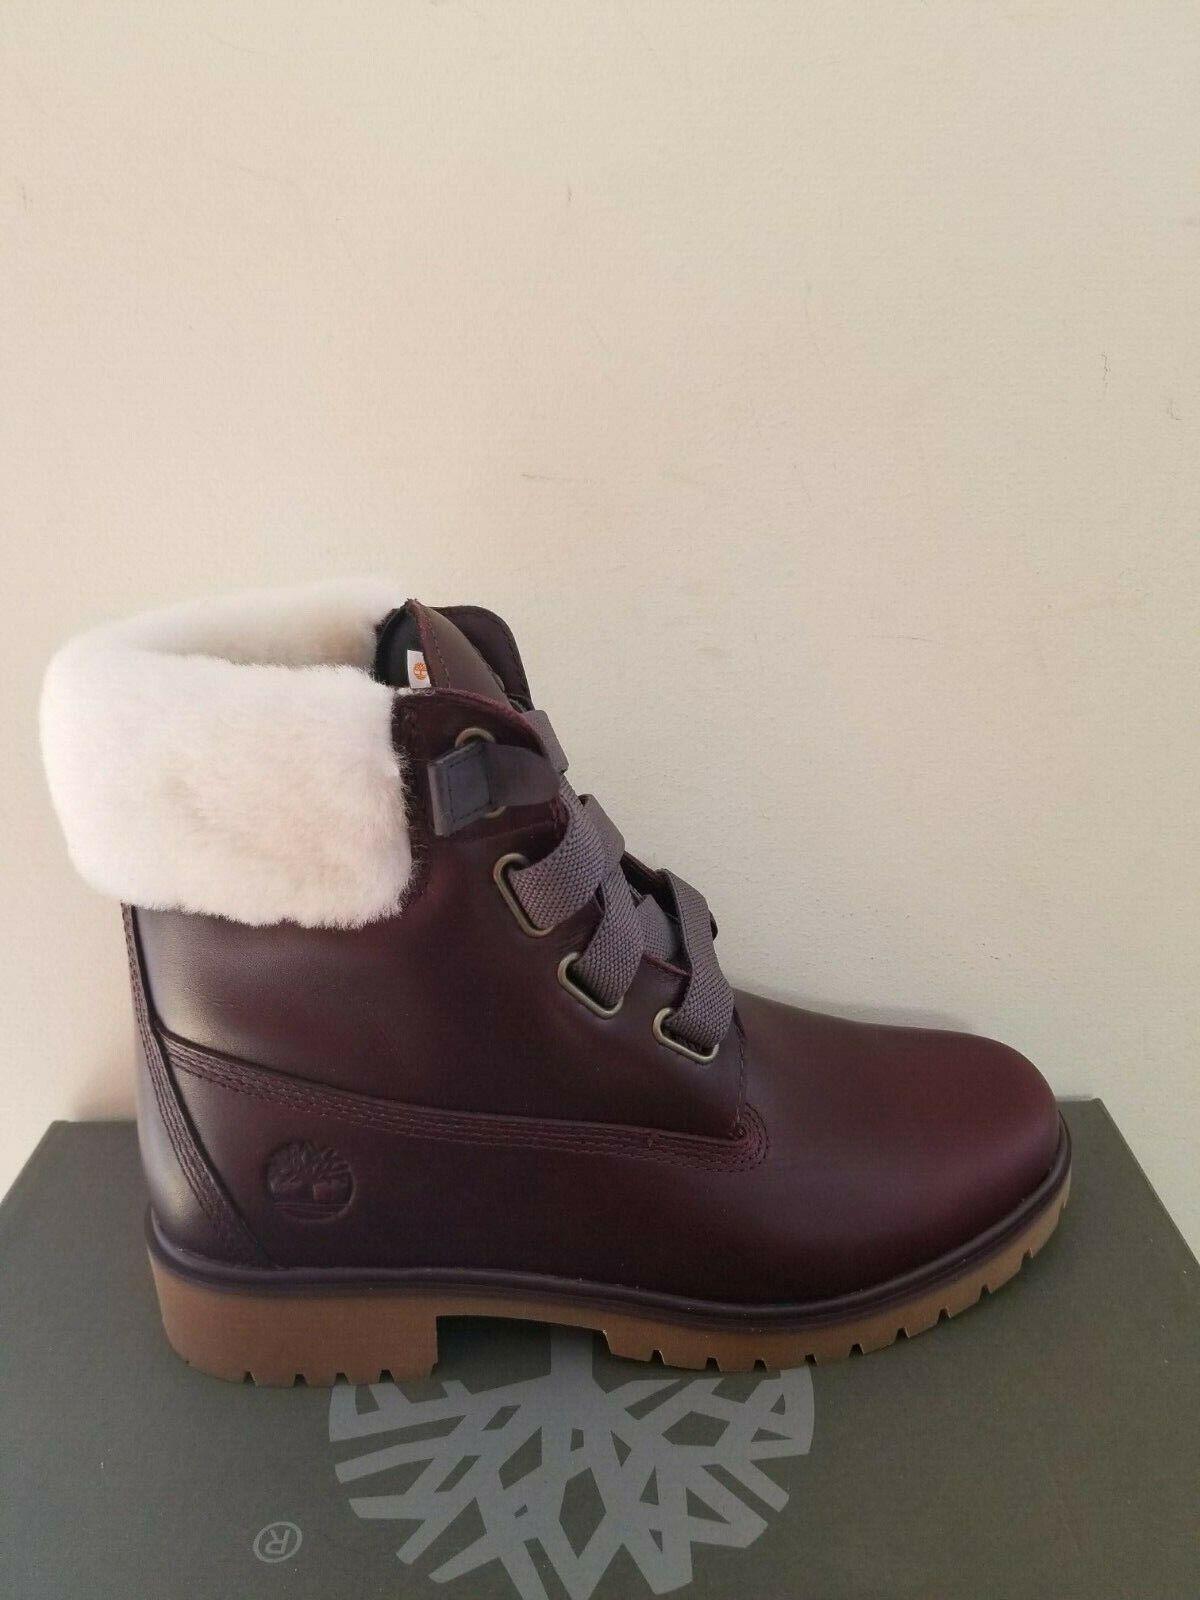 "Timberland Women's Jayne 6"" Waterproof Convenience Double Sole Premium Boots NIB"